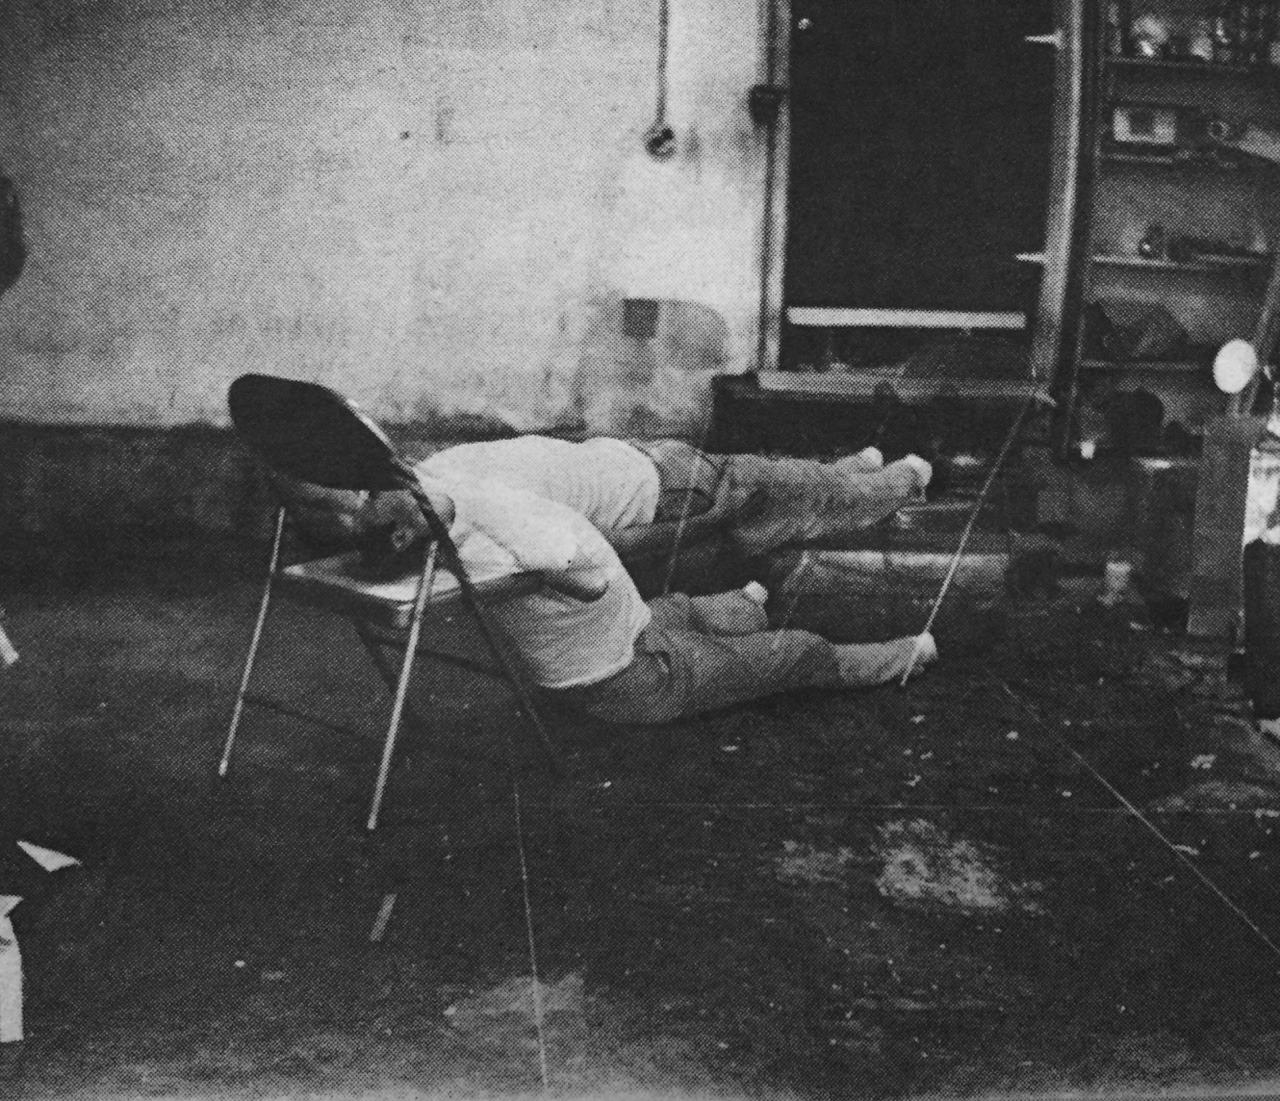 Bruce Nauman,  Failing to levitate in the studio , 1966